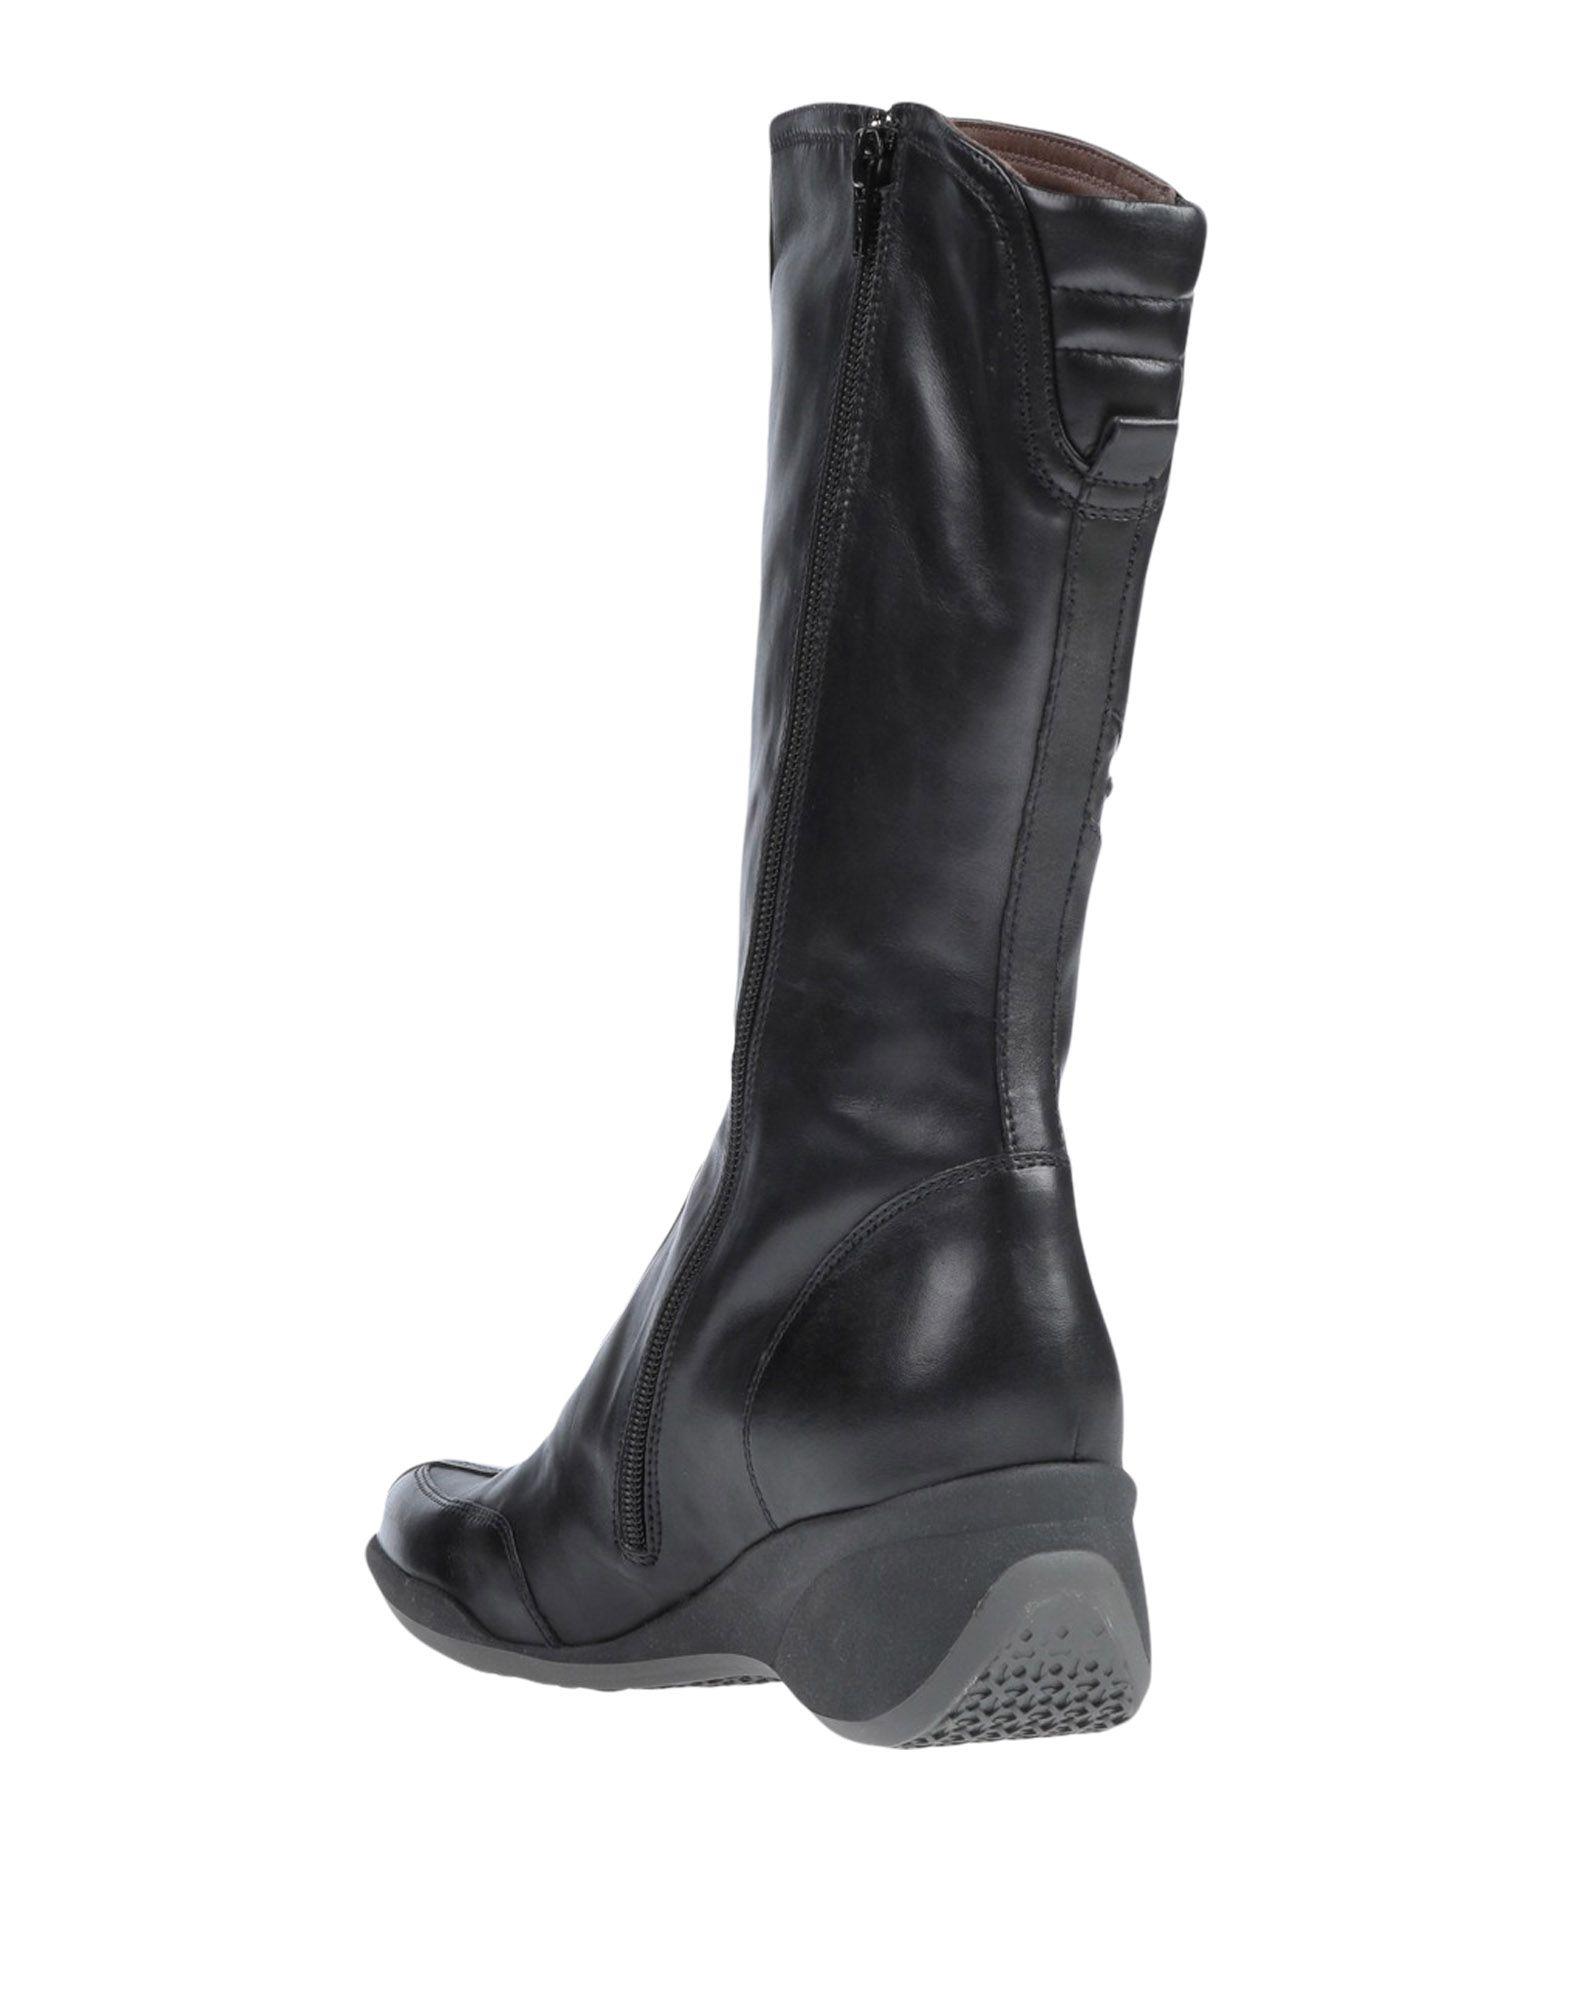 Nero Giardini Stiefel Damen  11539425GD 11539425GD 11539425GD Gute Qualität beliebte Schuhe df54d8